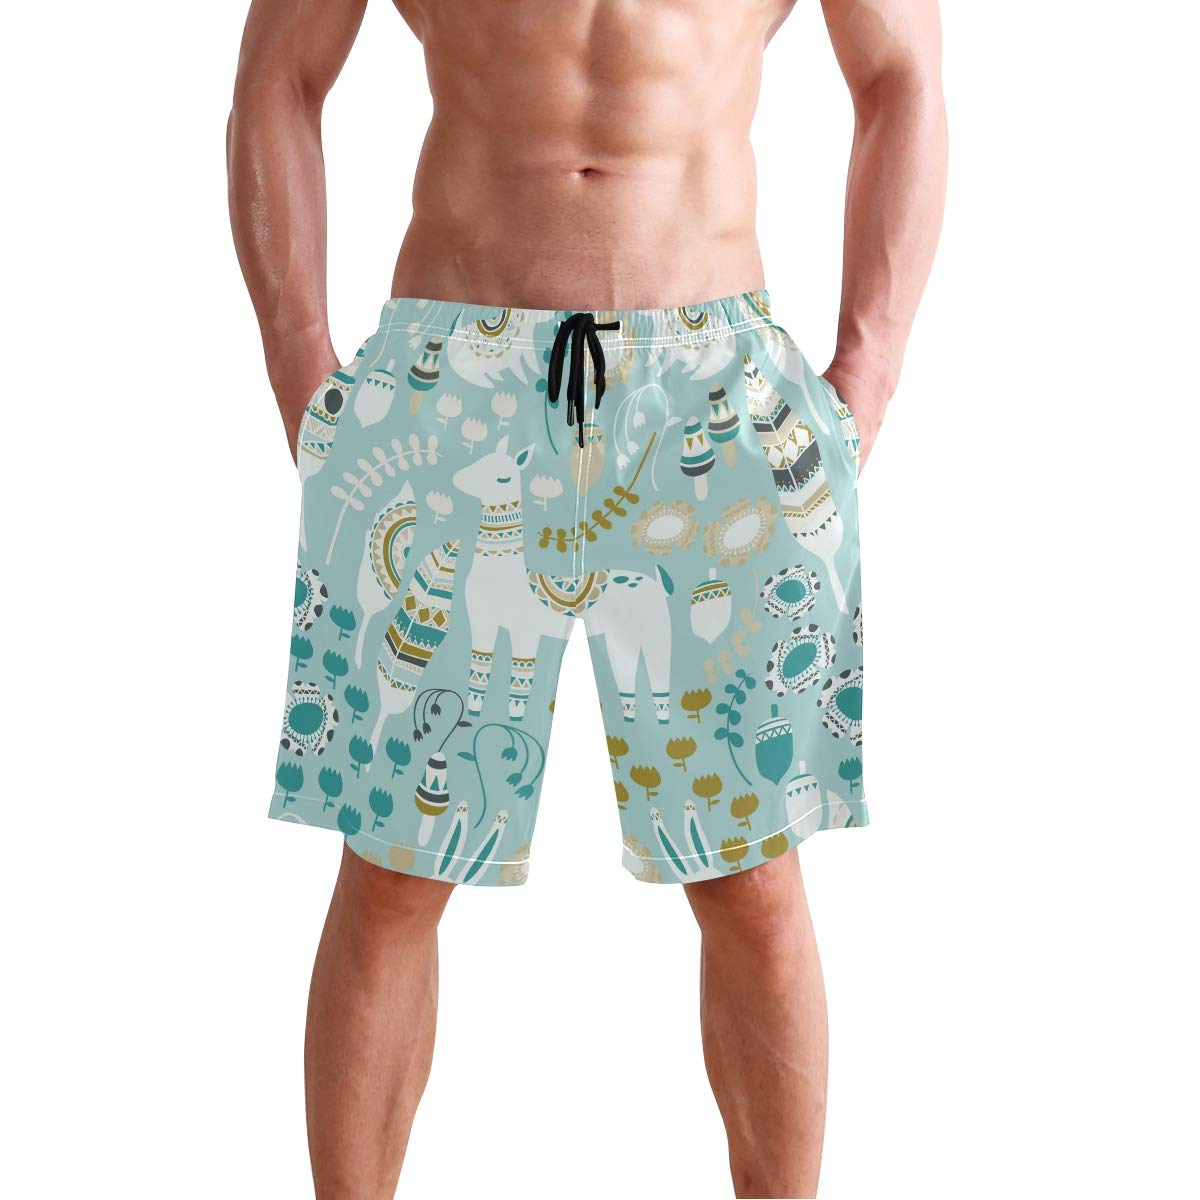 CiCily Men/'s Swim Trunks Feather Goat Beach Board Shorts Swimming Short Pants Running Sports Surffing Shorts